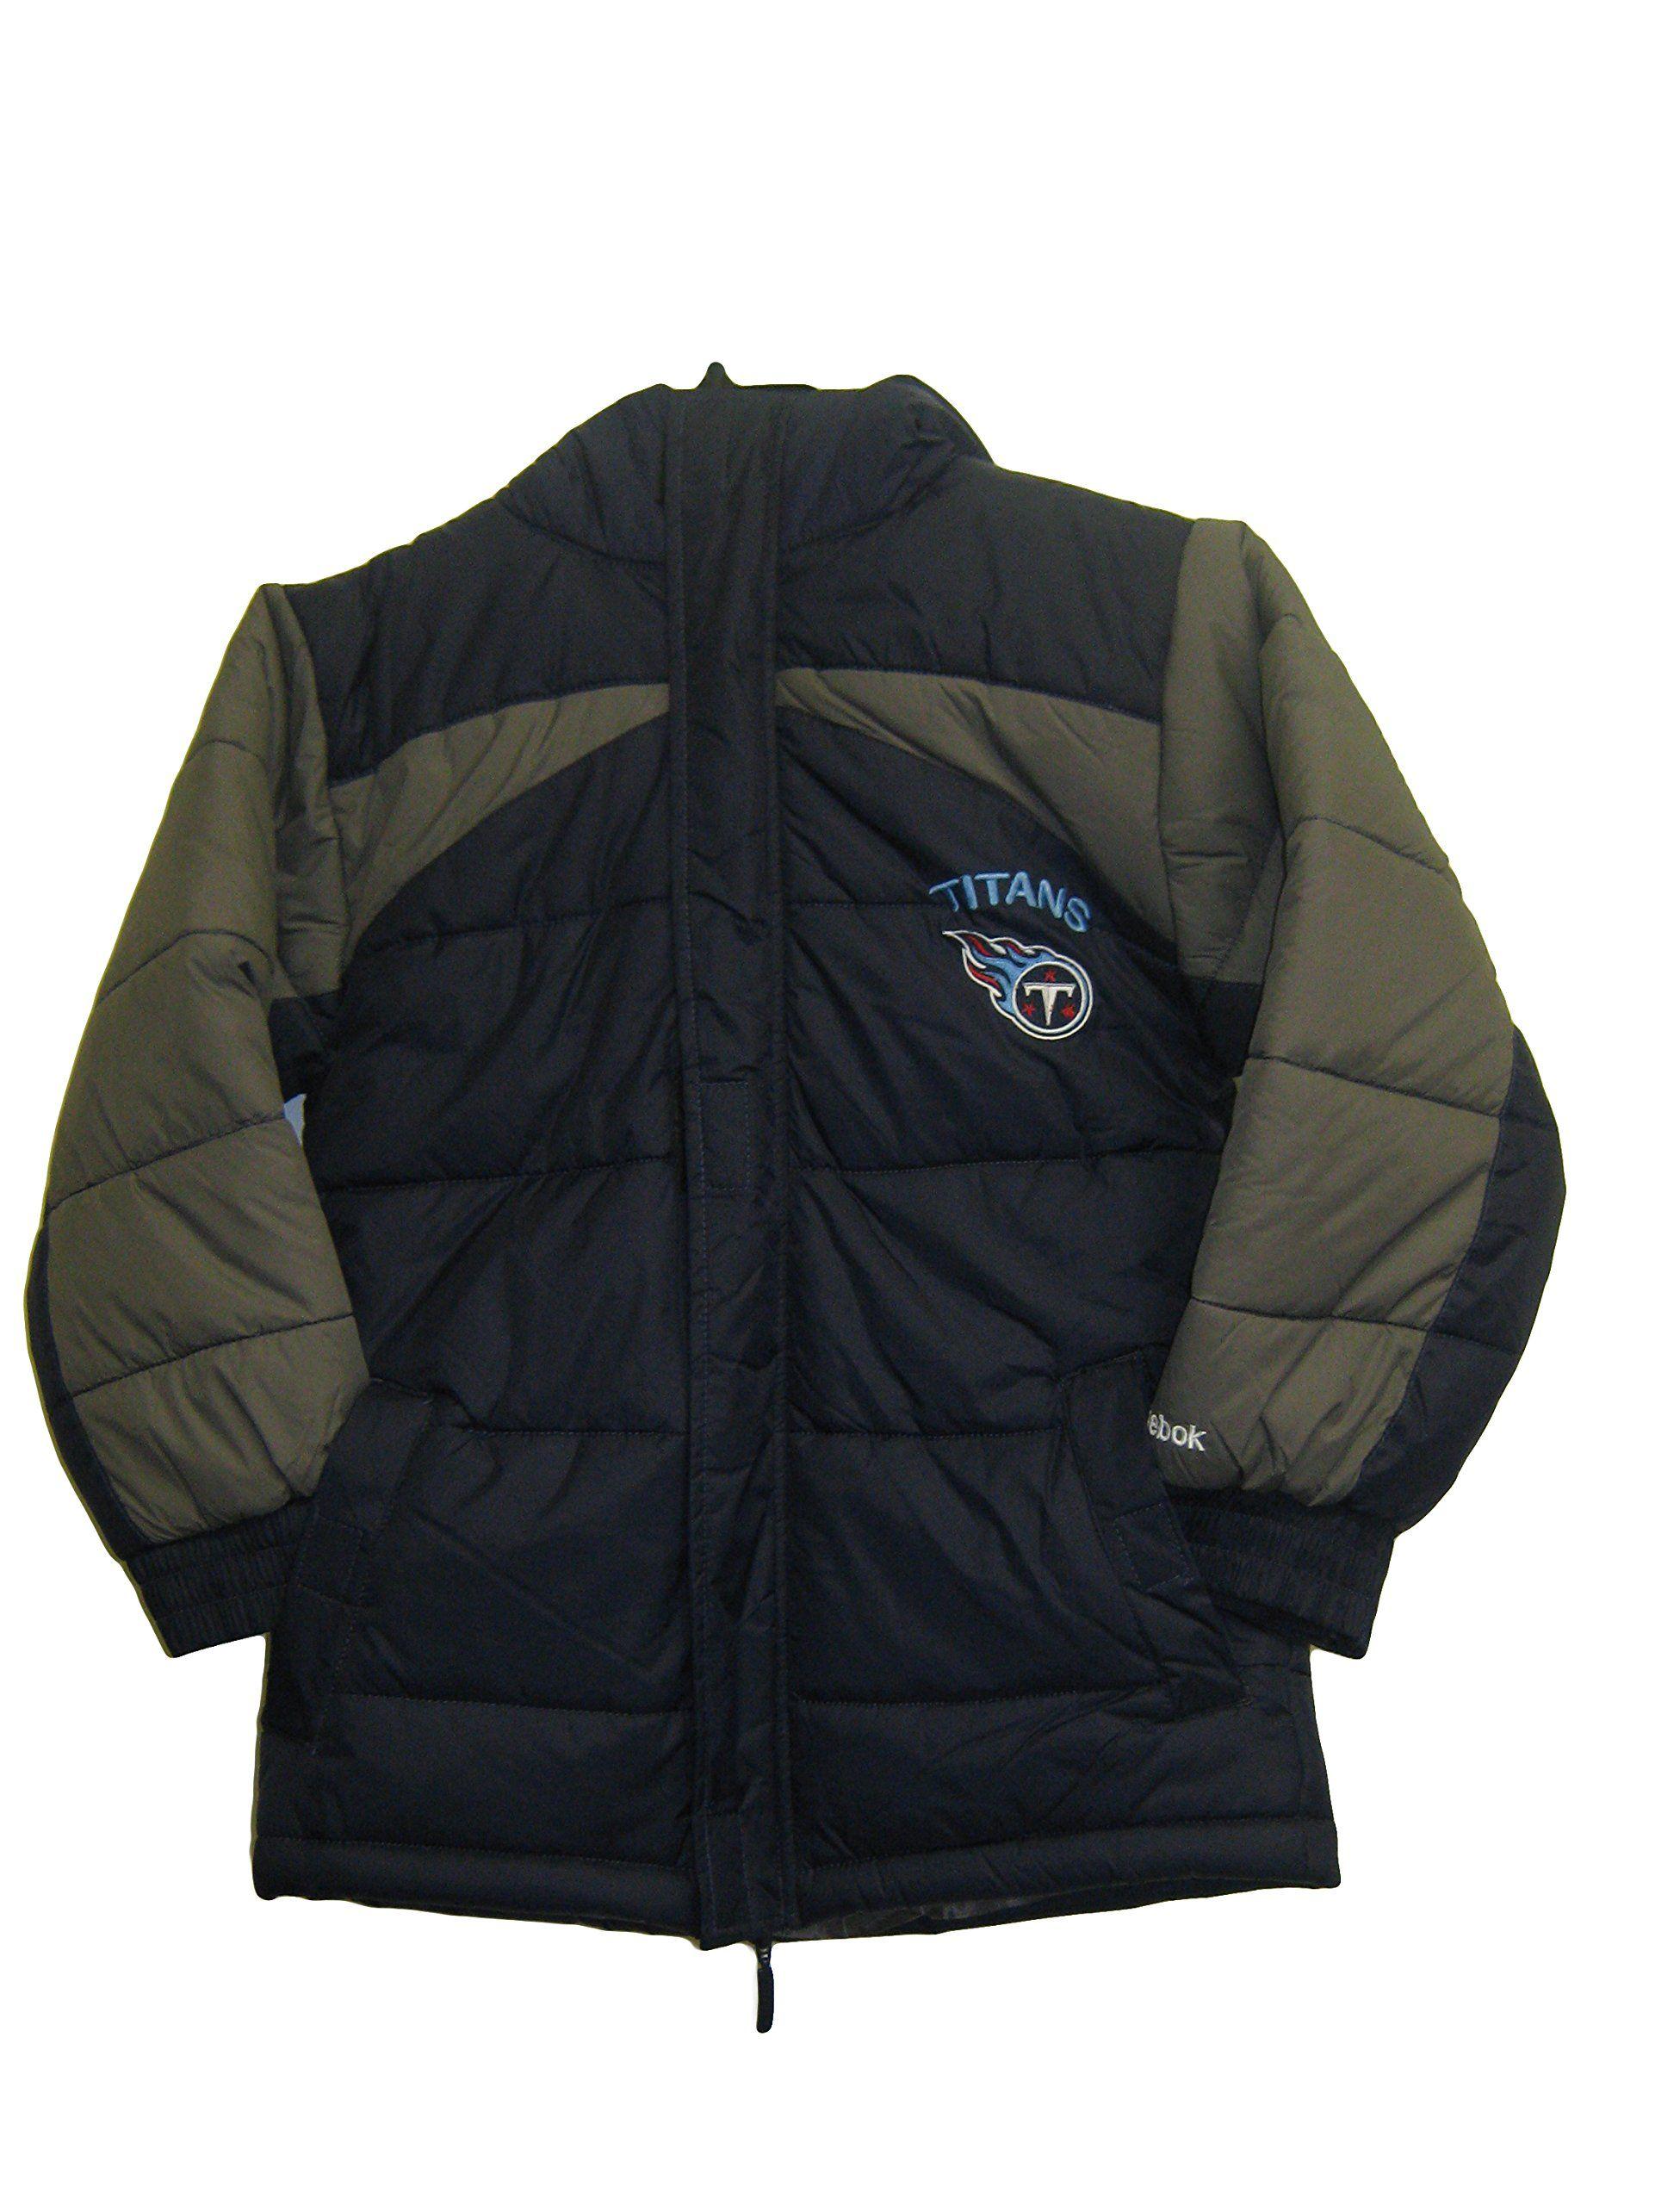 1ecb48be5 Nfl Youth Jackets